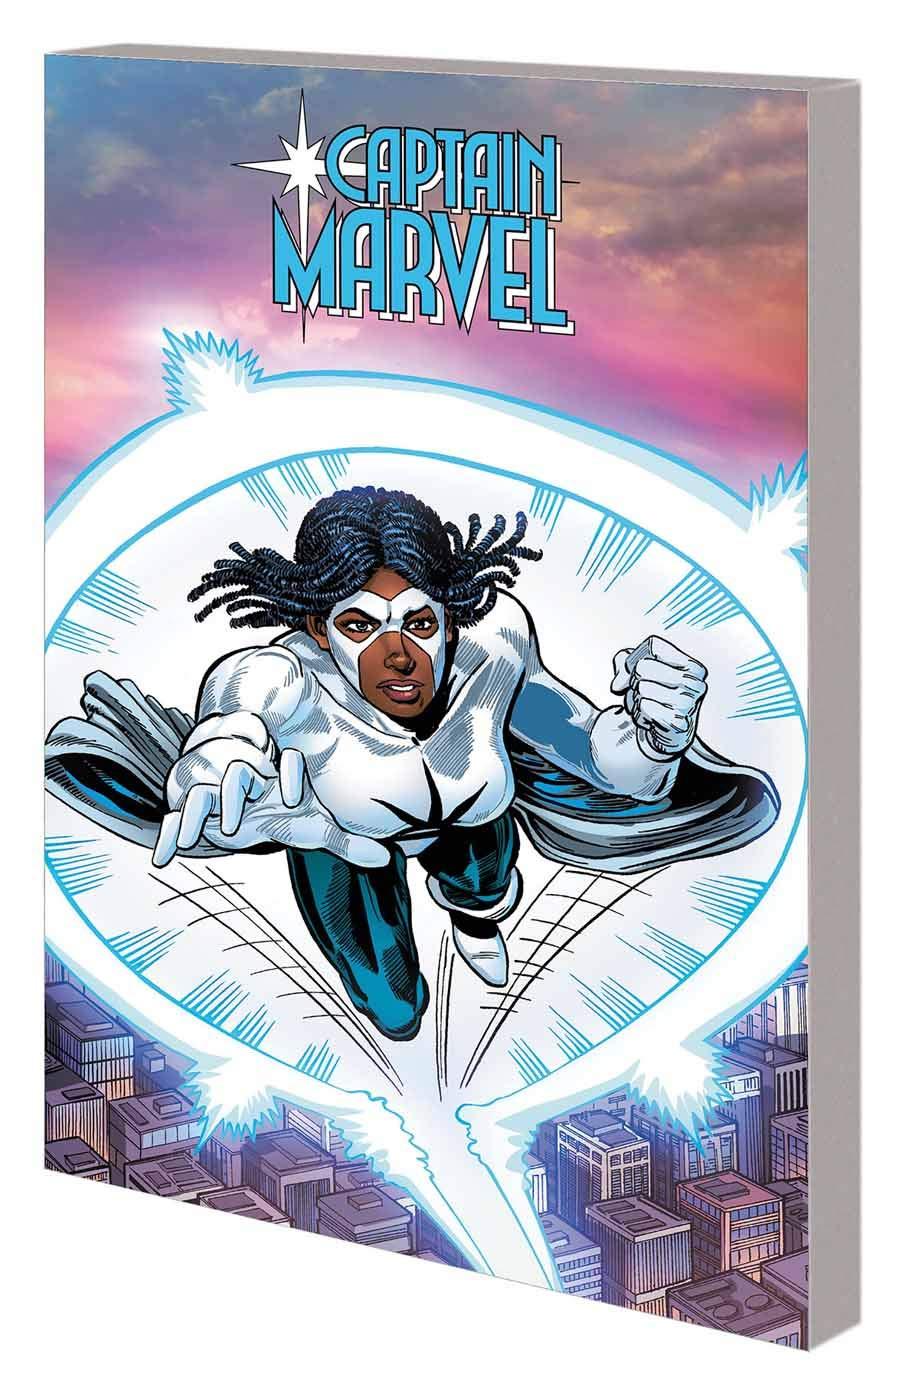 Amazon Com Captain Marvel Monica Rambeau 9781302917562 Marvel Comics Books Fan art monica rambeau, captain marvel. captain marvel monica rambeau